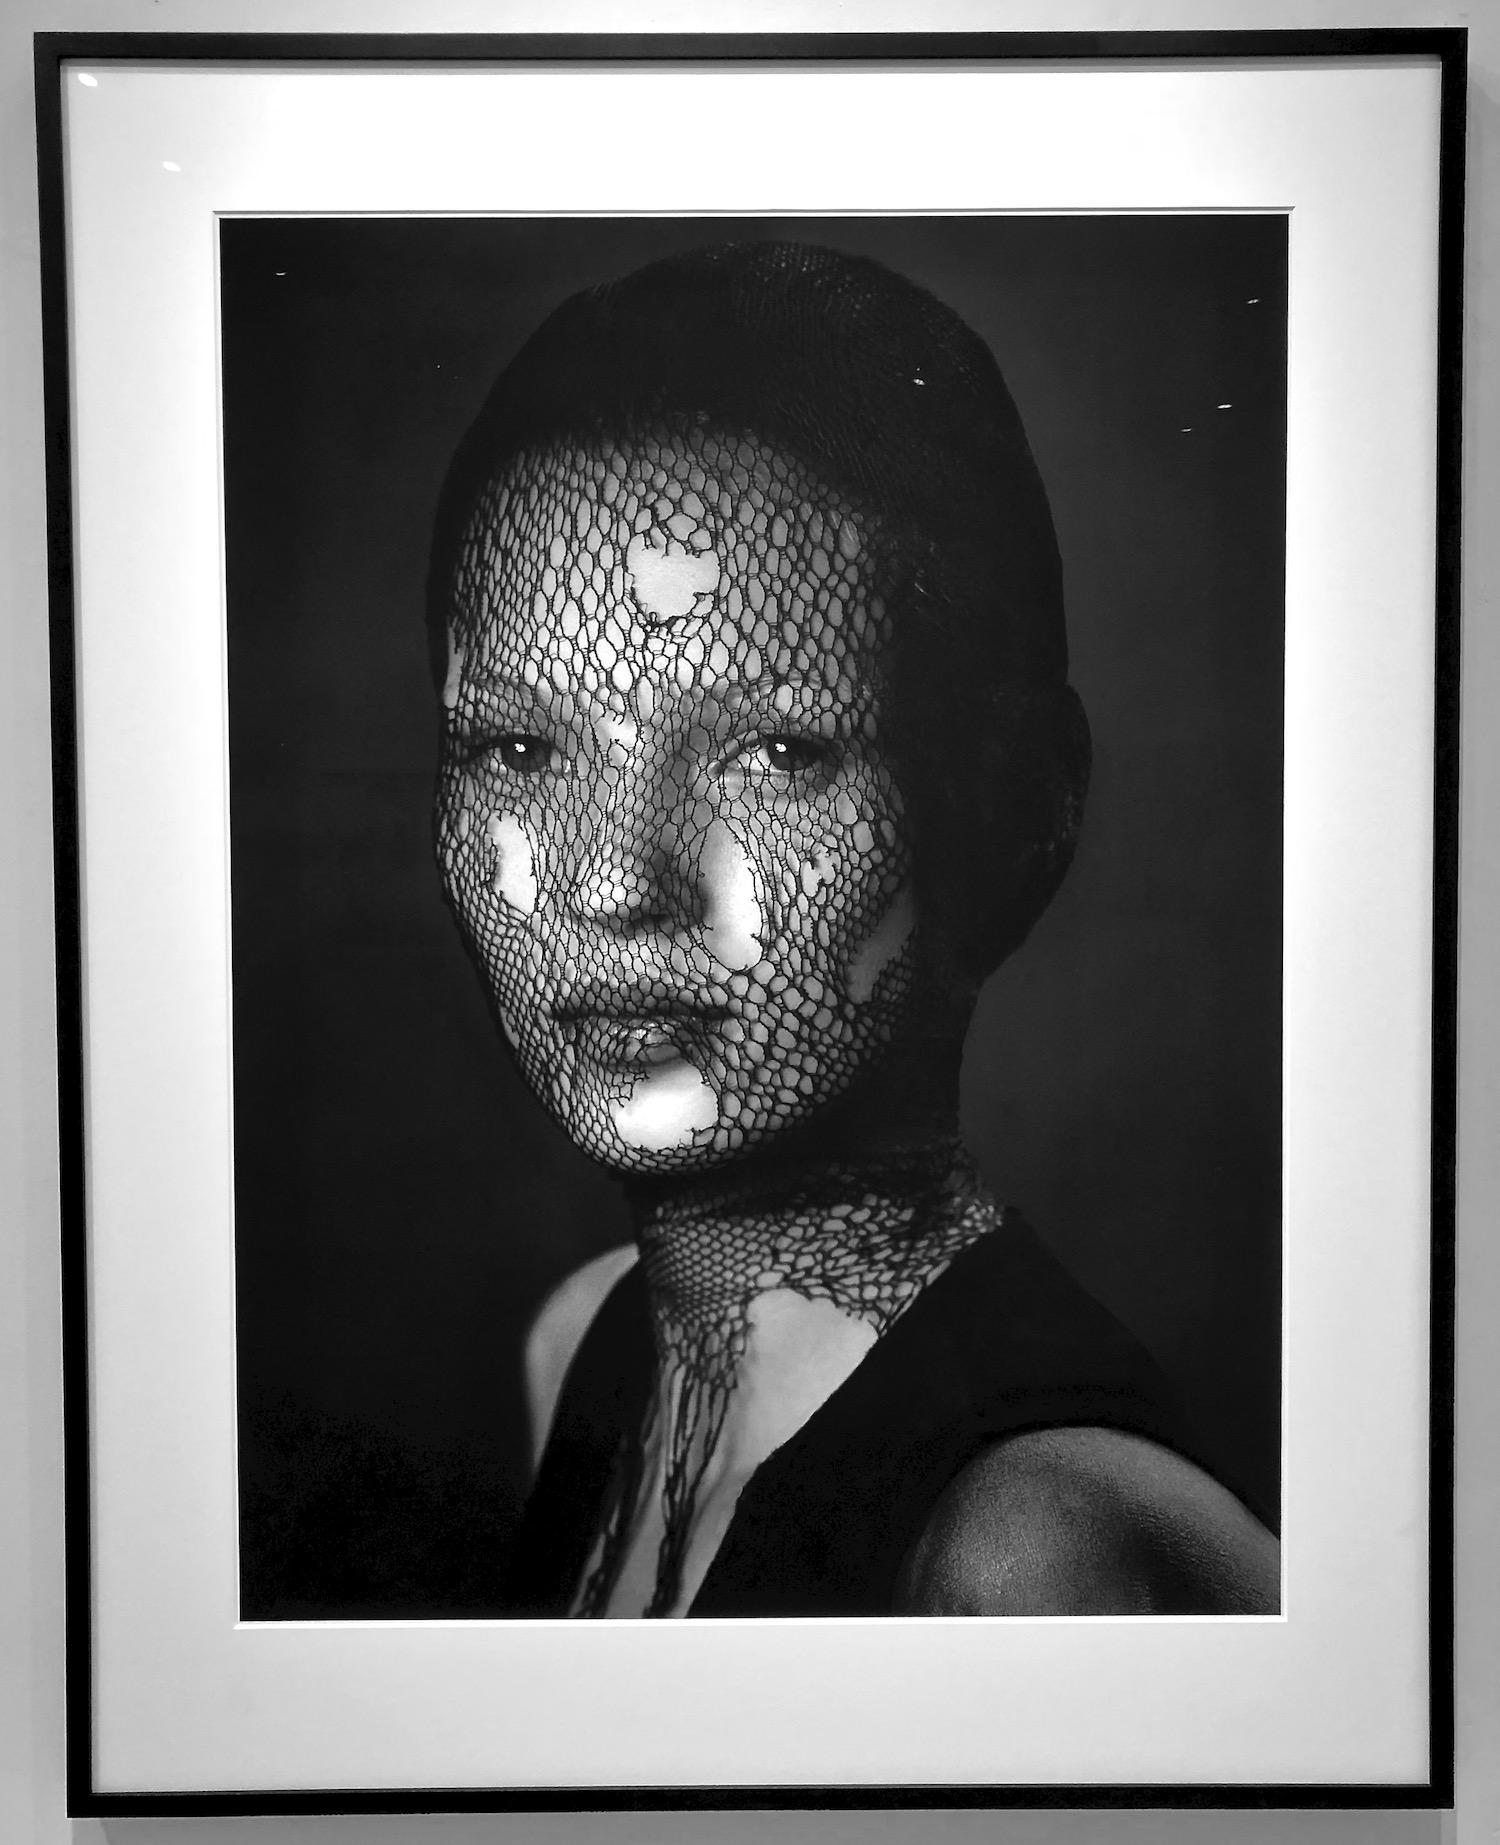 Albert Watson Kate Moss Torn Veil, 1993 Archival pigment photograph 106.68 x 142.24 cm | 42 x 56 in Edition of 10 AWA/F 1